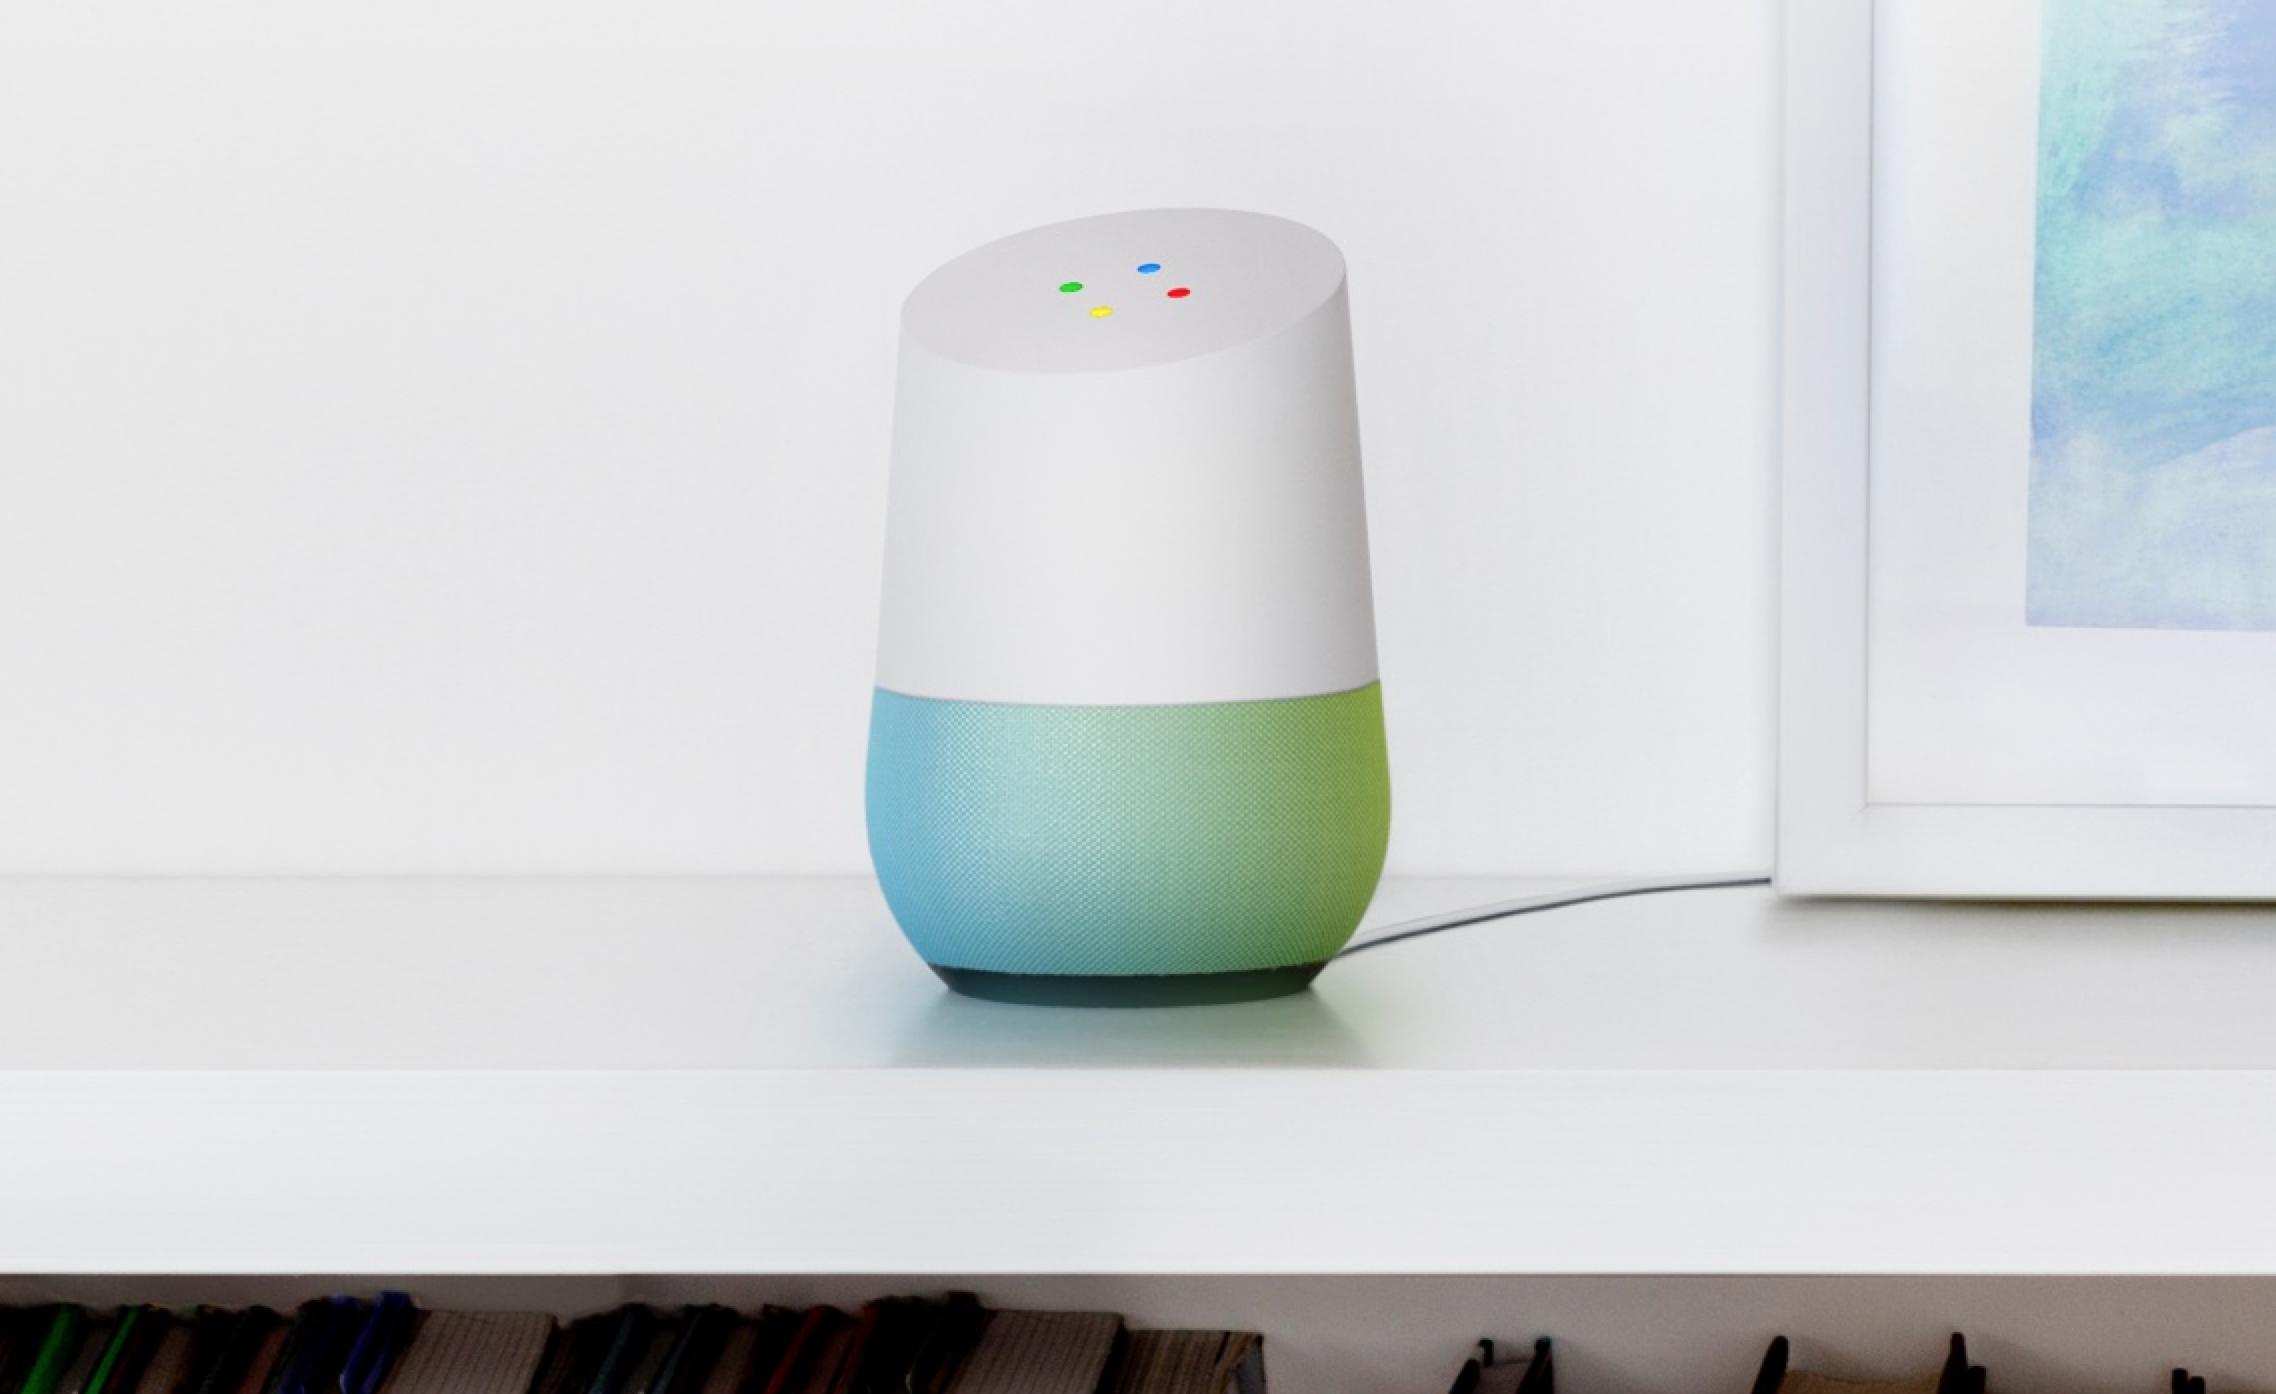 Google Home device